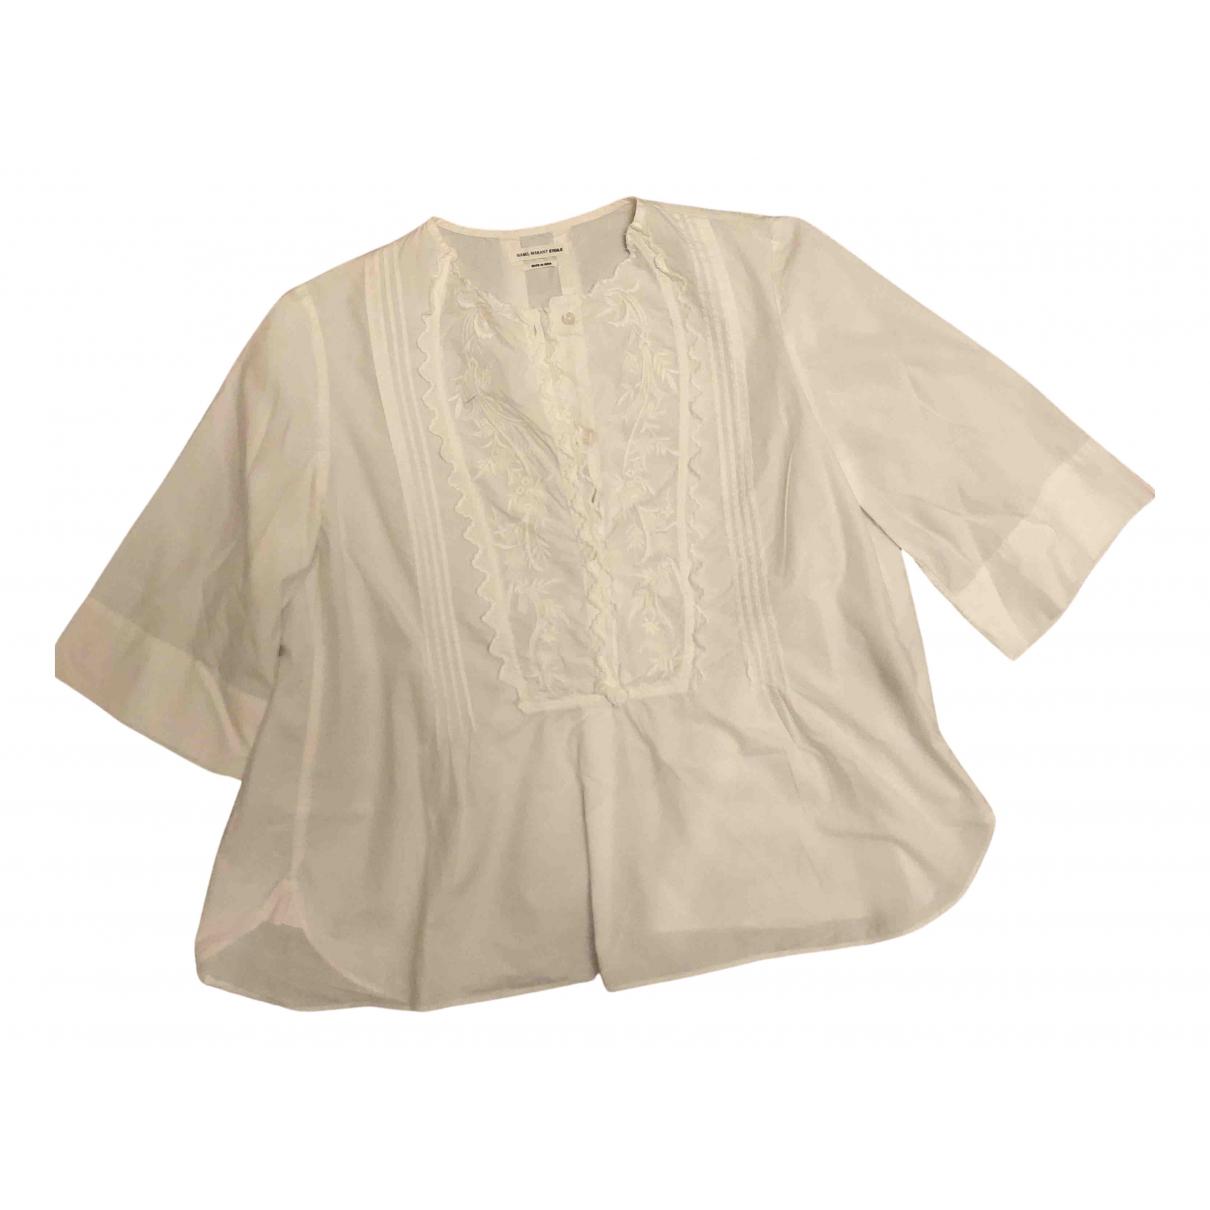 Isabel Marant Etoile N White Cotton  top for Women 40 FR